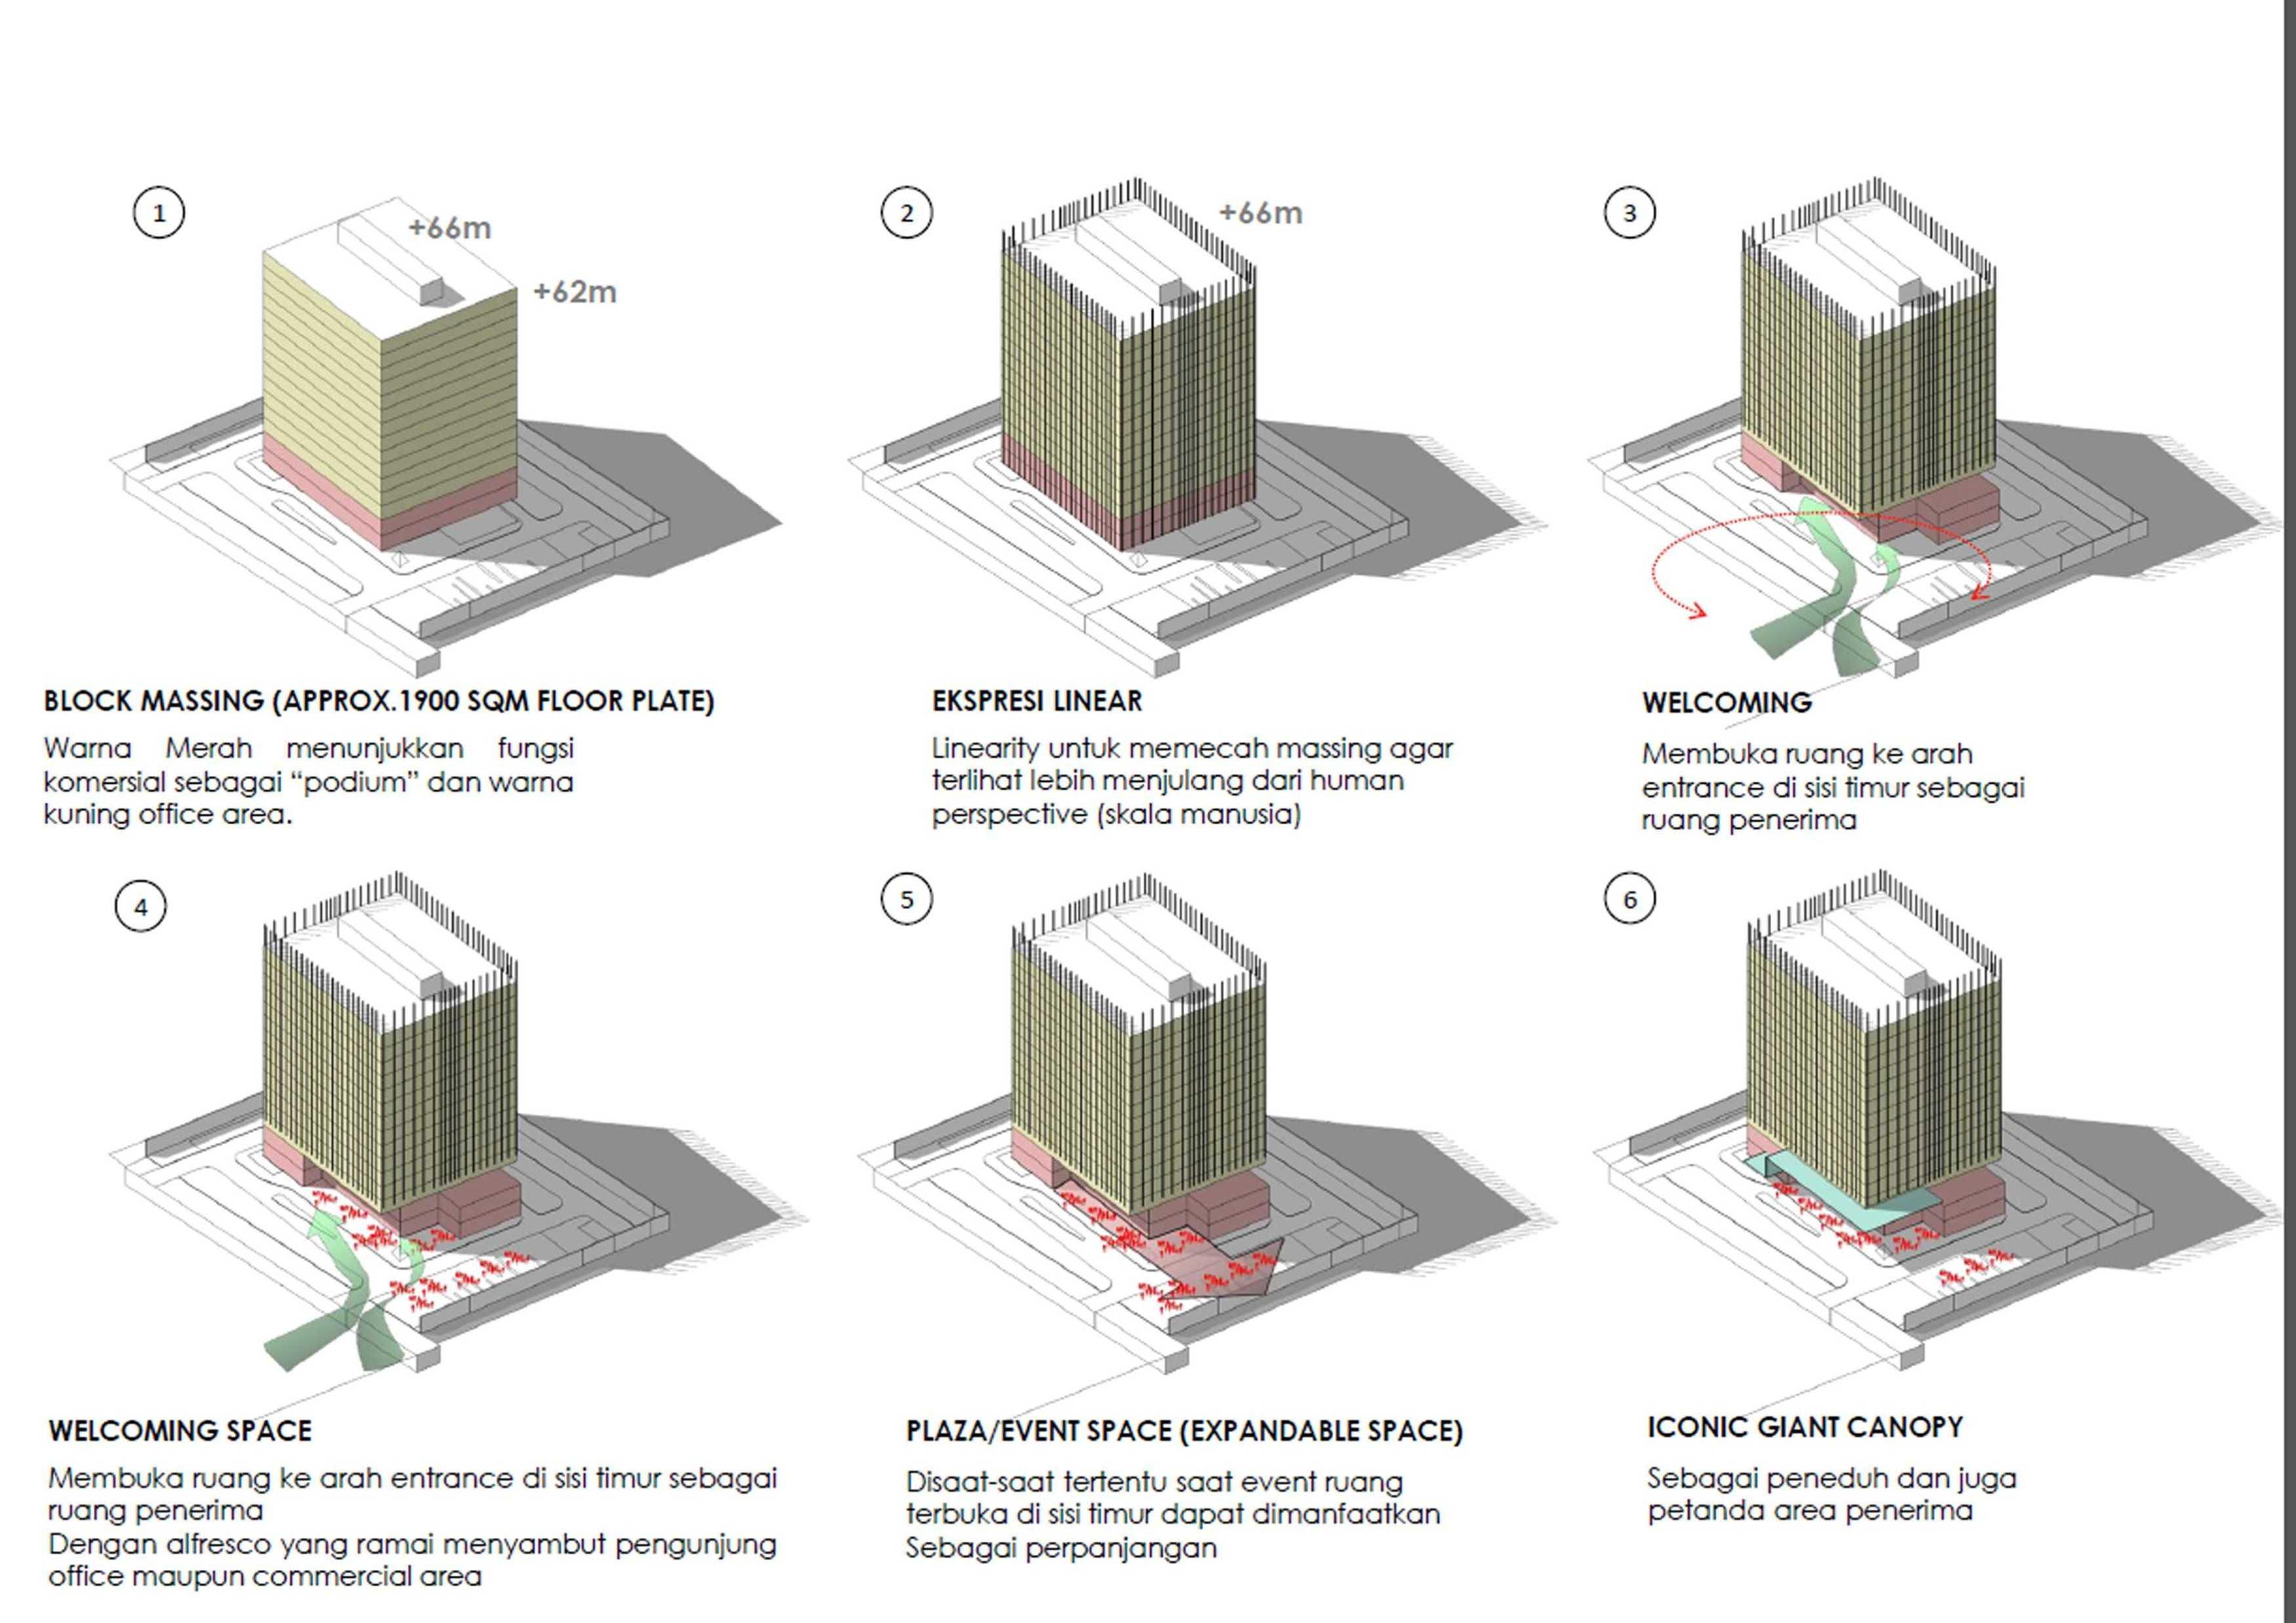 "Moi Architects Mt Office ""the Urban Canopy"" Jakarta, Daerah Khusus Ibukota Jakarta, Indonesia Jakarta, Daerah Khusus Ibukota Jakarta, Indonesia Moi-Architects-Mt-Office-The-Urban-Canopy   59032"